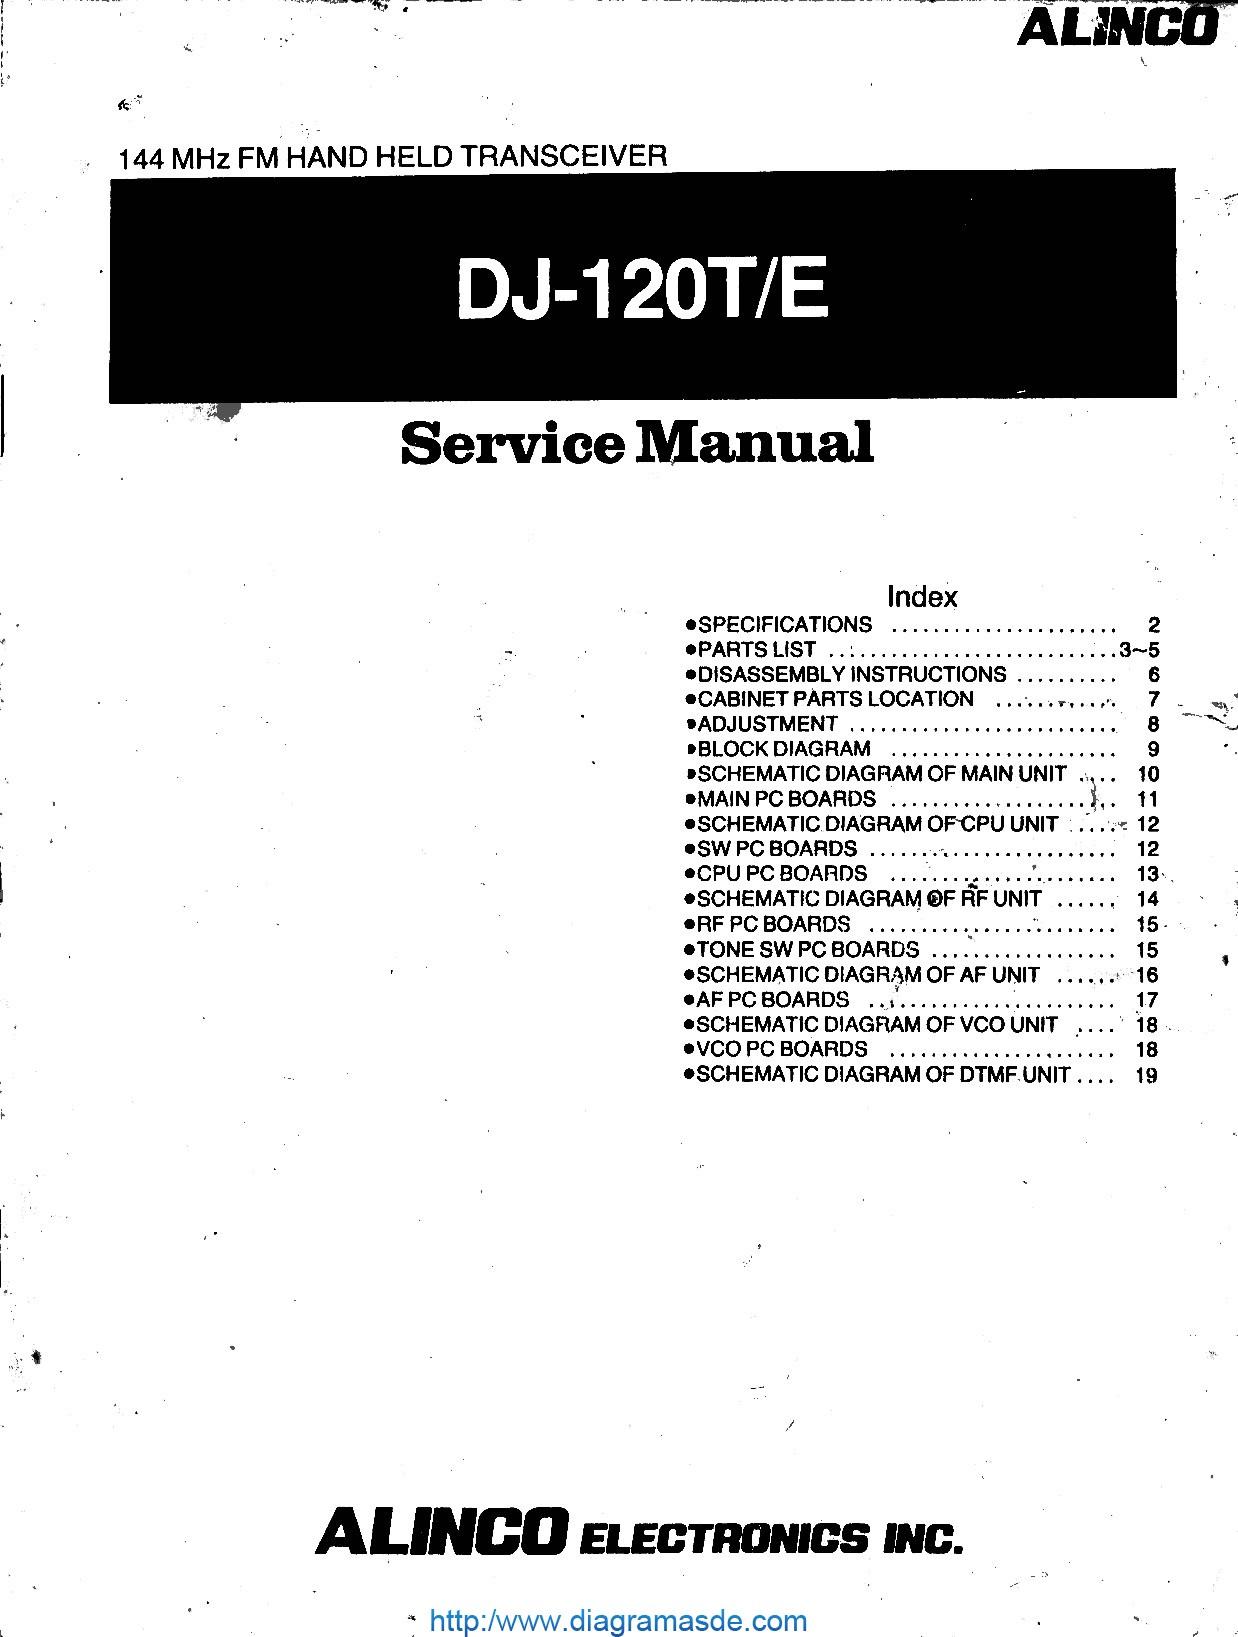 DJ-120 Service manual.pdf Alinco Alinco DJ-120T